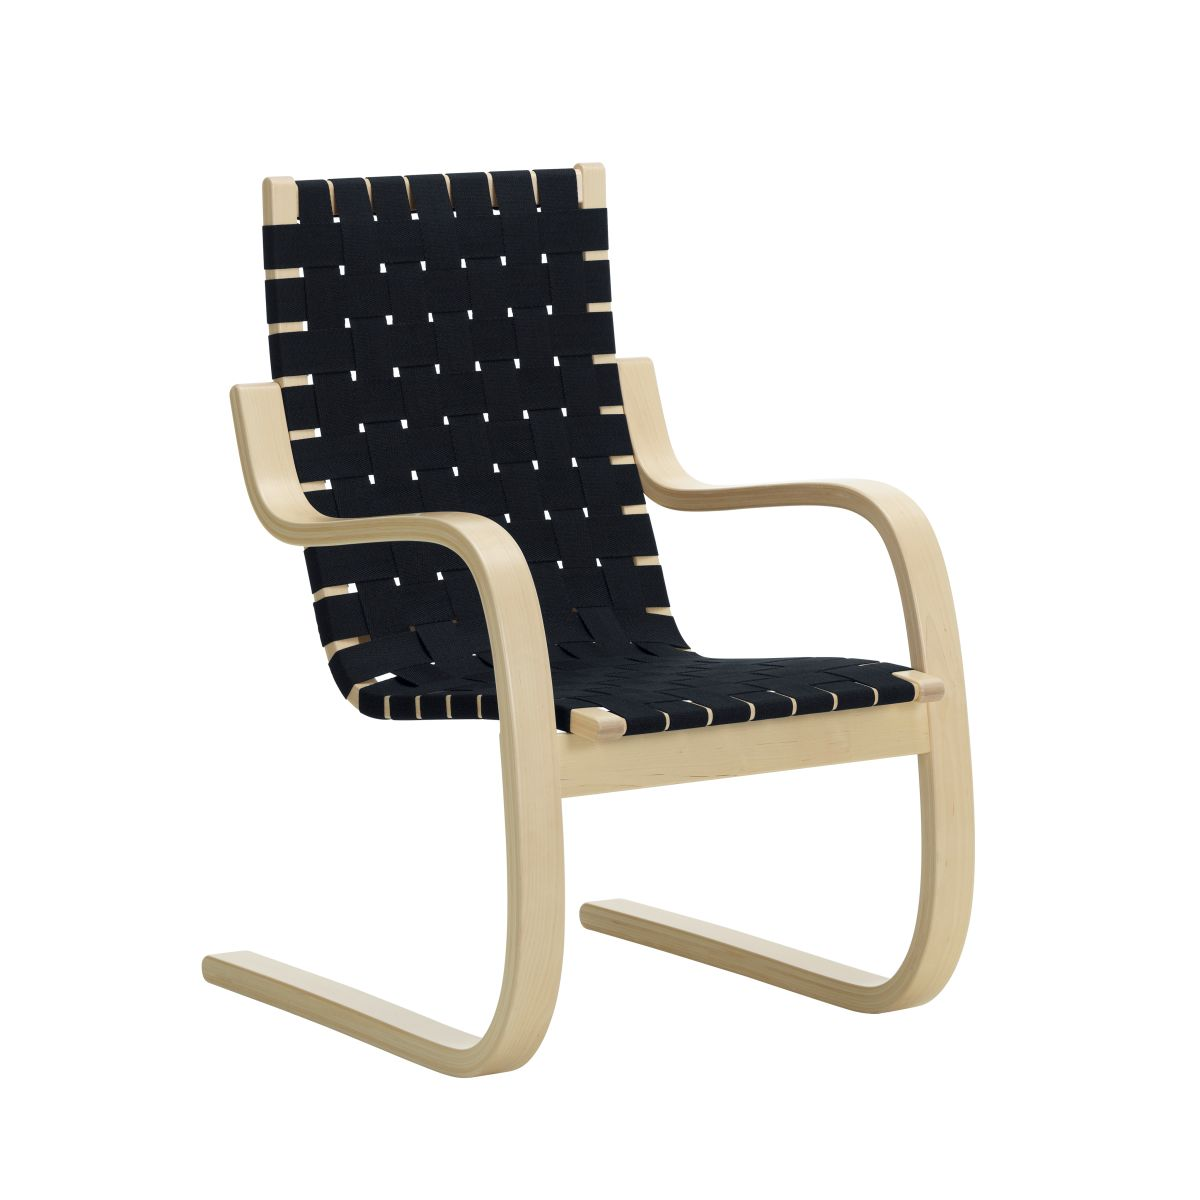 Armchair-406-natural-black-blue-webbing_F-2897107